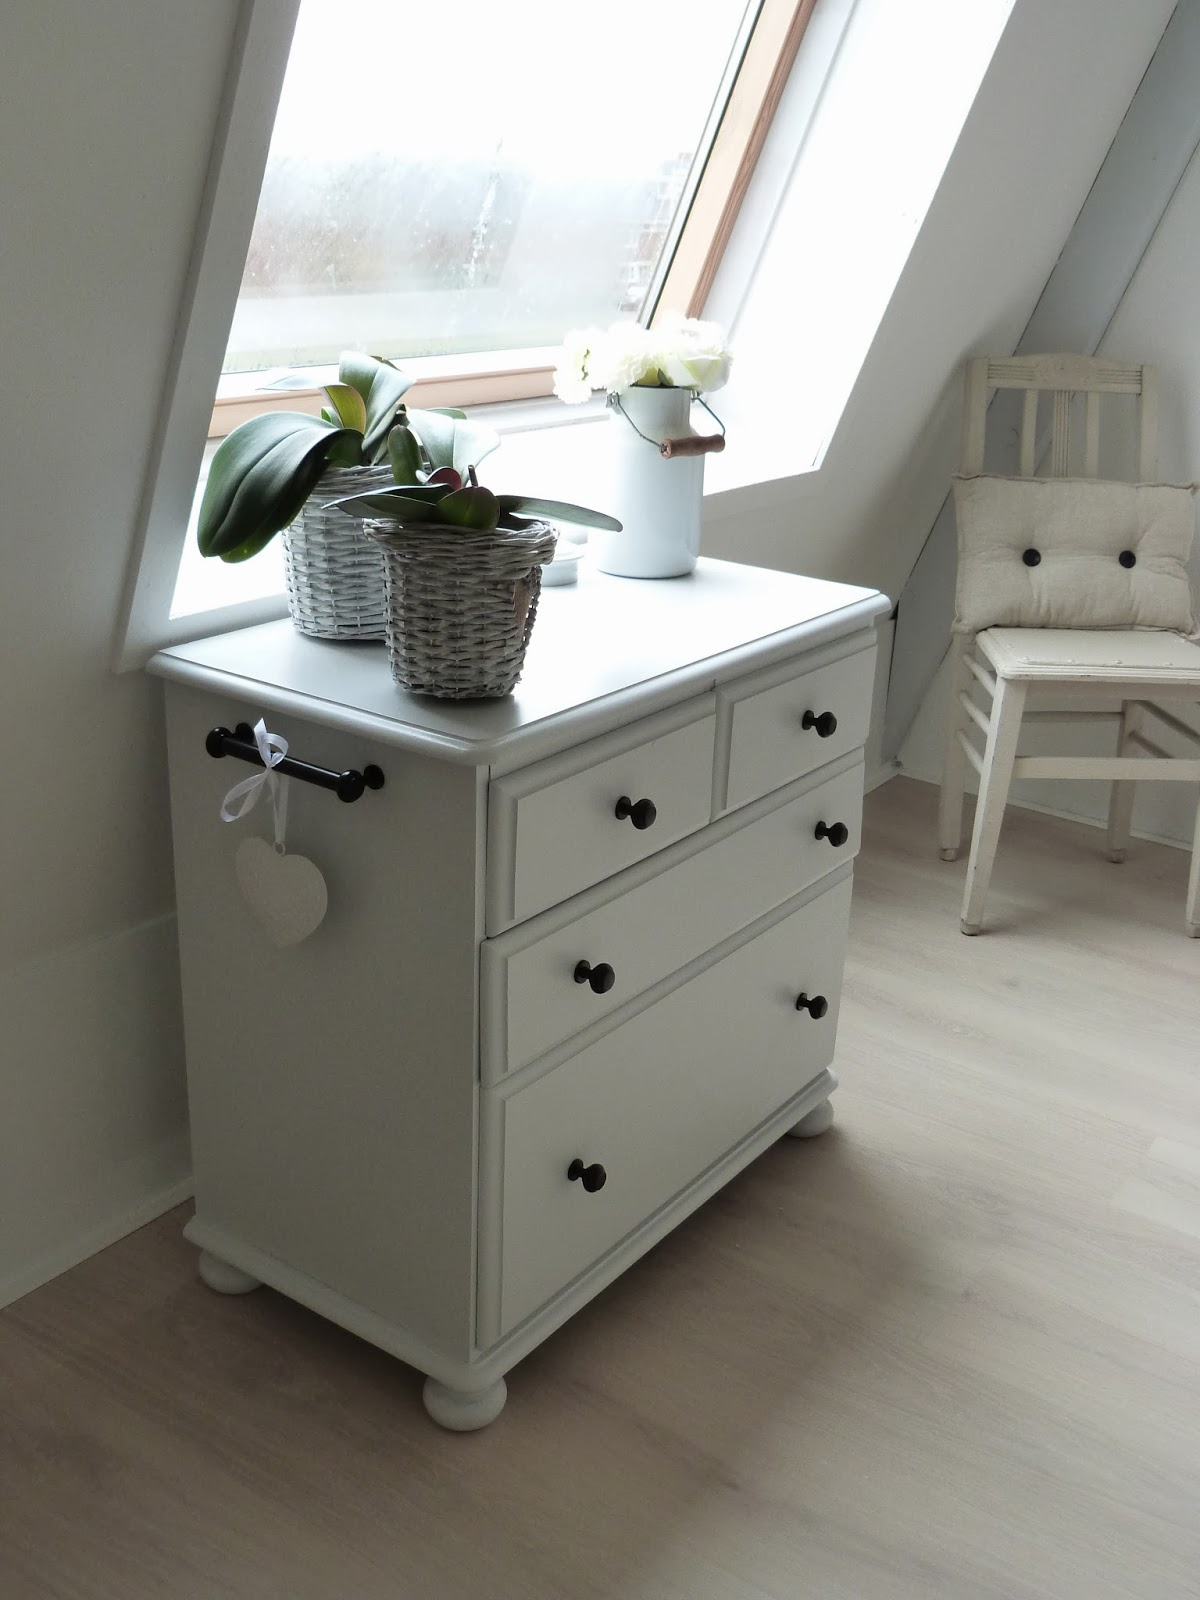 Ikea ladenkast slaapkamer ~ [spscents.com]